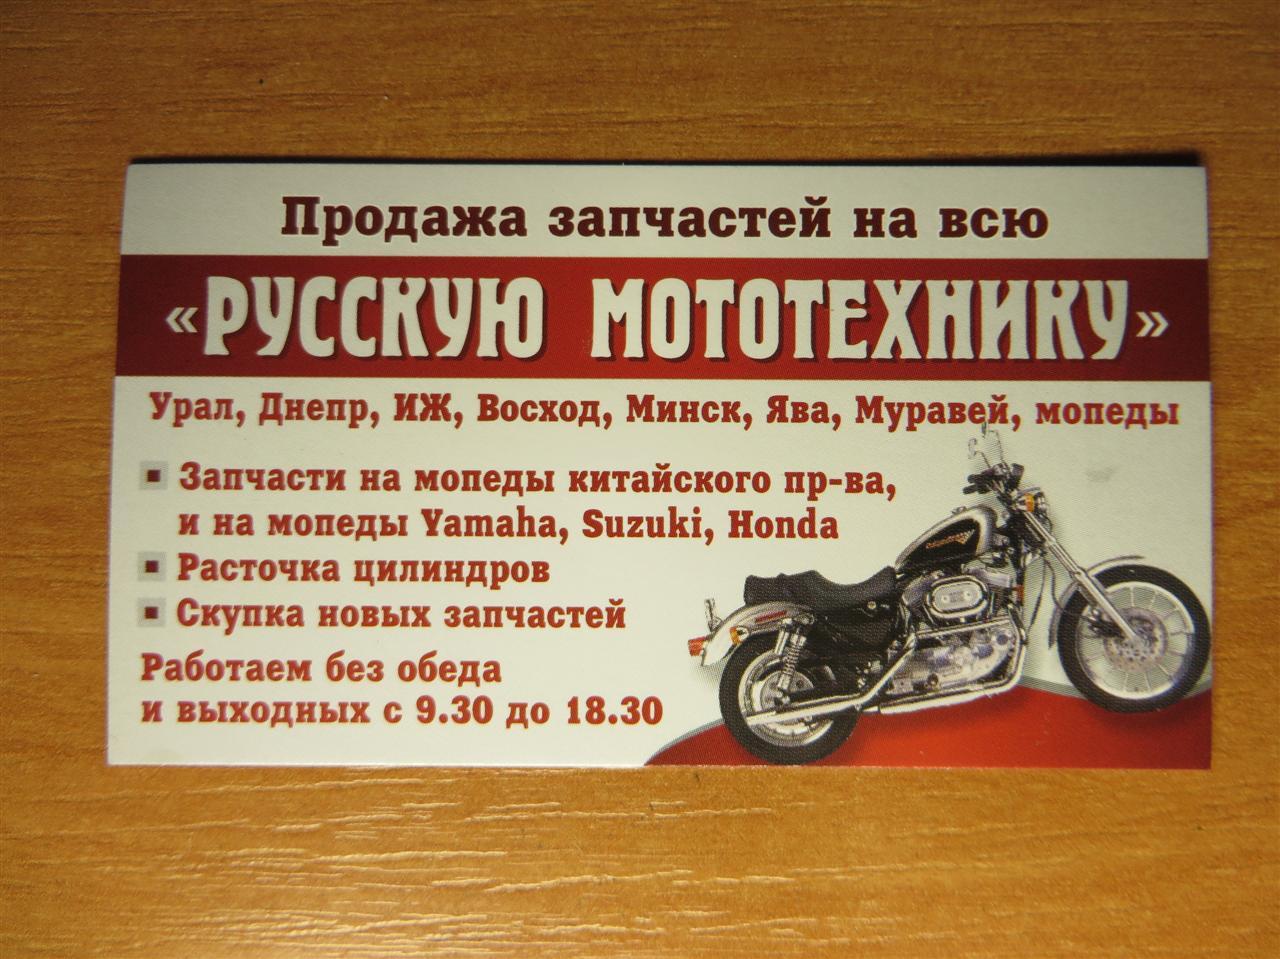 www.bildites.lv/images/5jpe79cz6pe07ib6c6g4.jpg